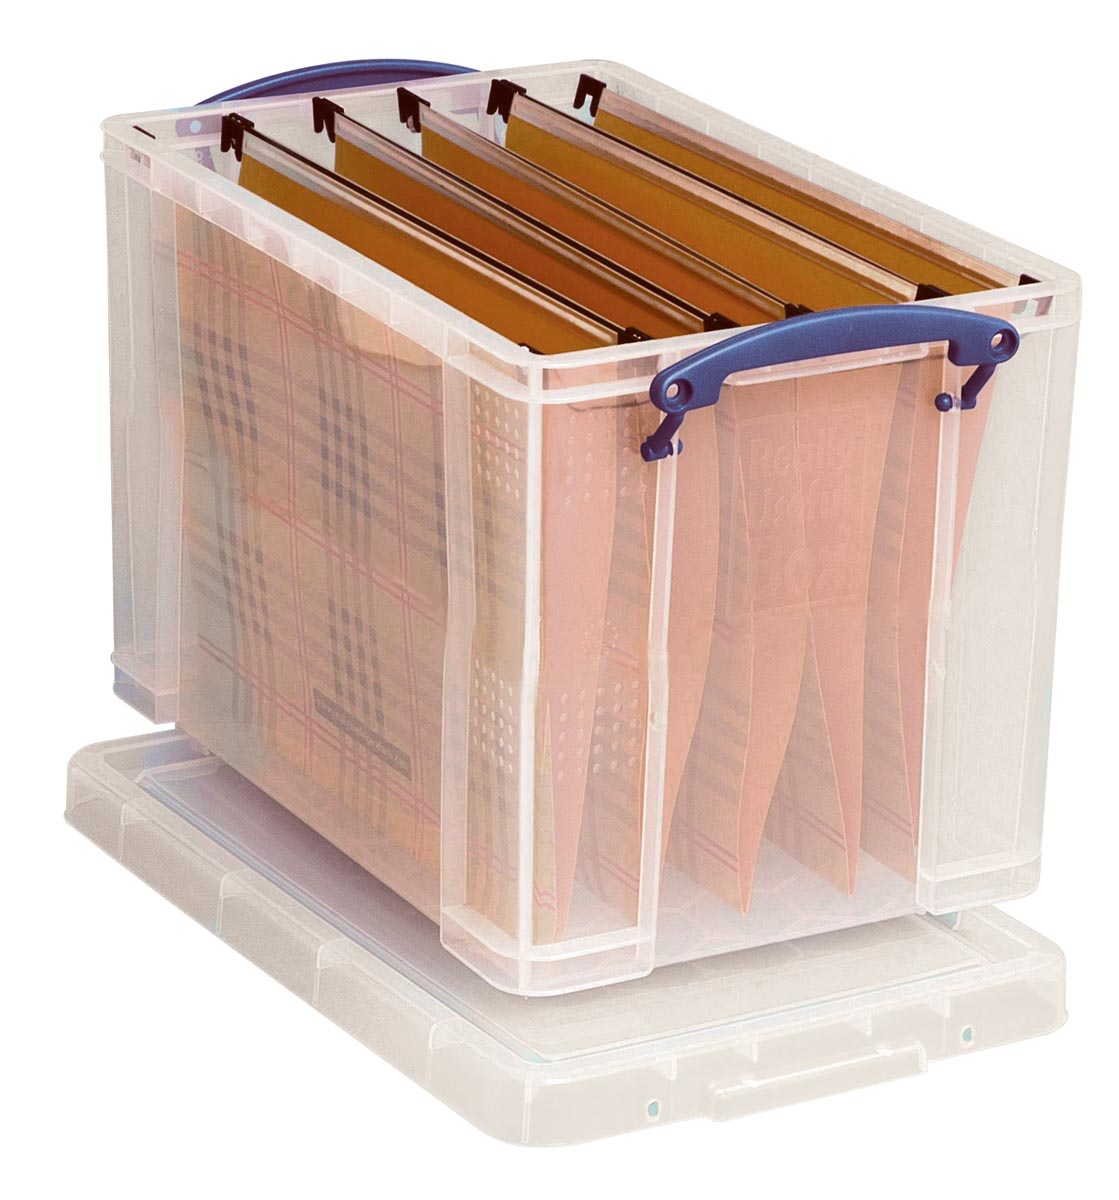 Really Useful Boxes Archiefboxen A4 Transparant Plastic met deksel 39 5 x 25 5 x 29 cm Stuks